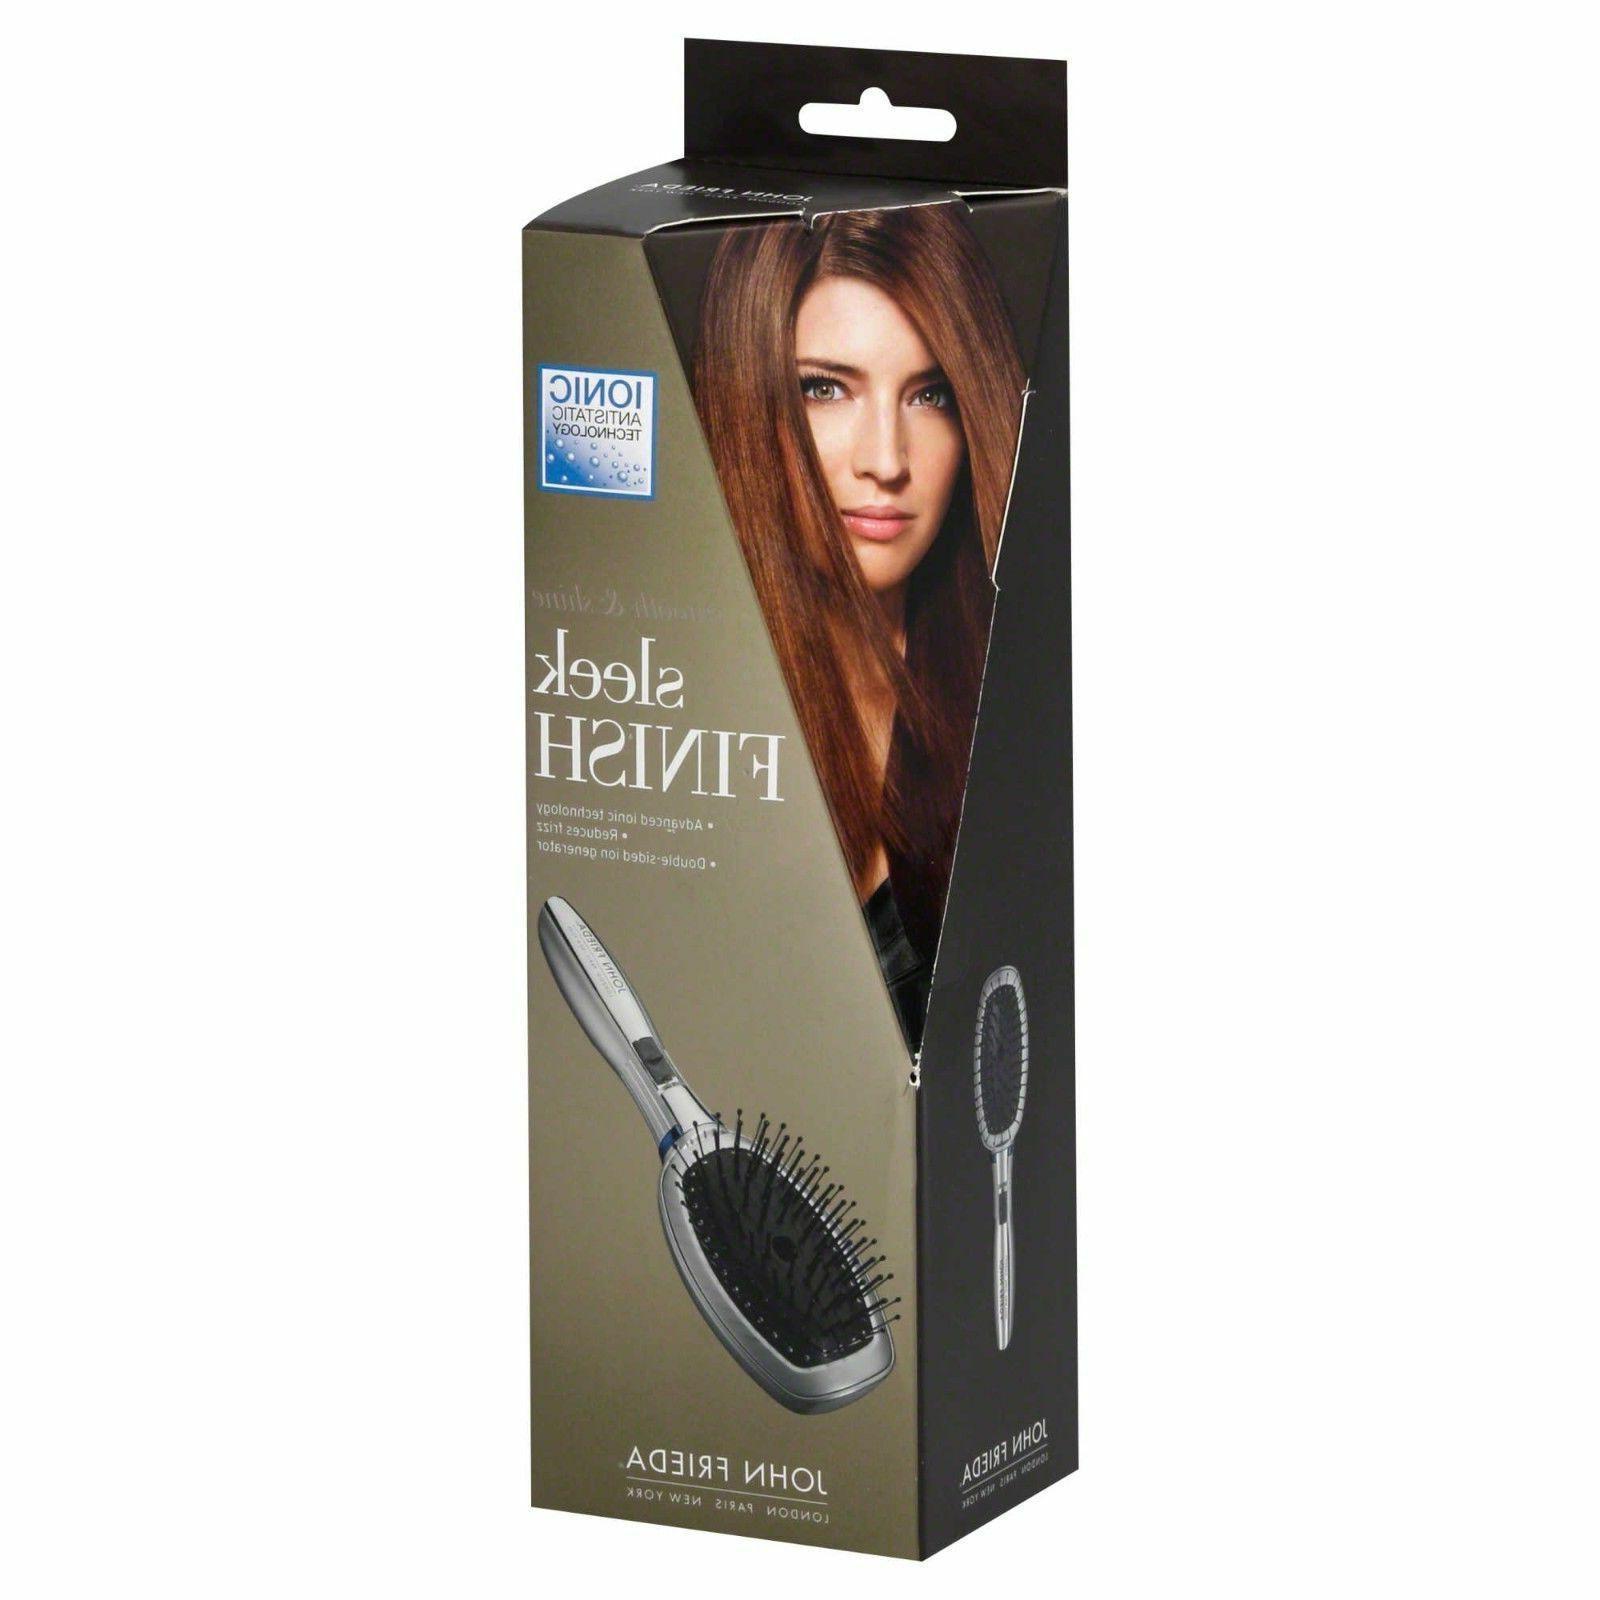 new john frieda ionic antistatic hair brush